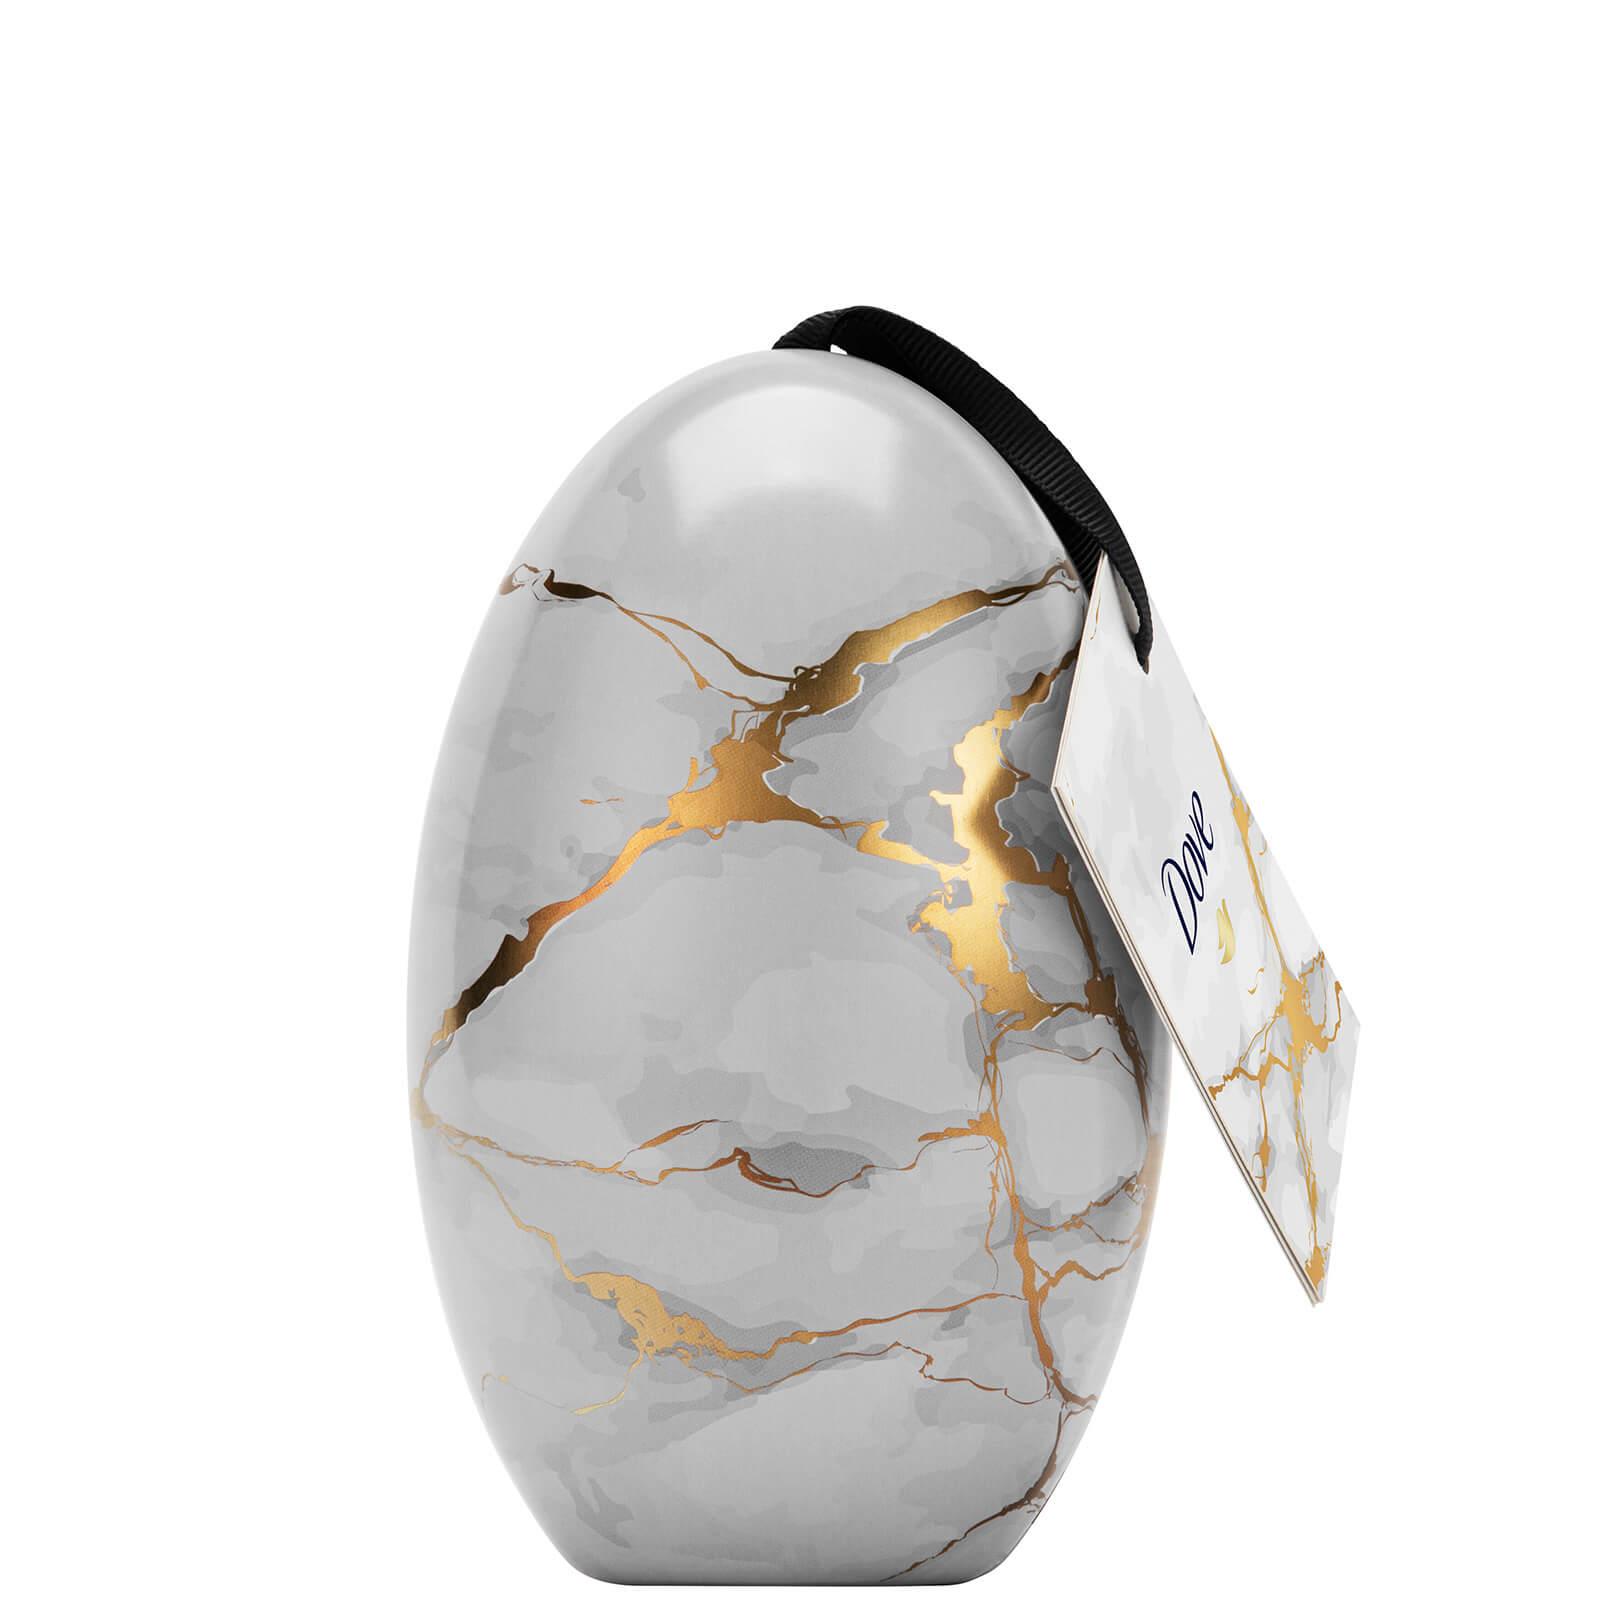 Dove Hand & Body Treats Gift Egg